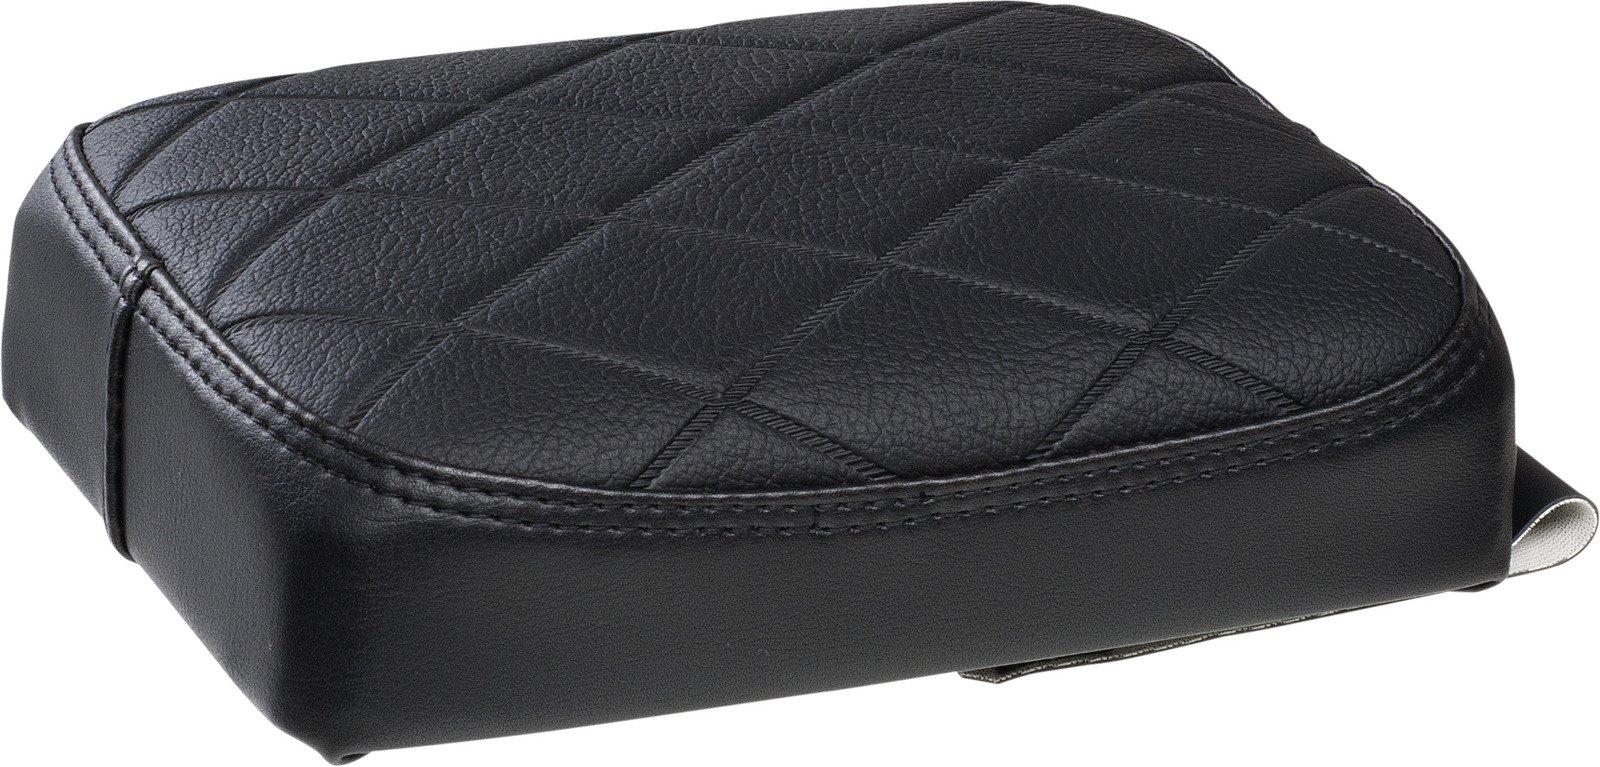 Passenger Seat Pad for 'GibbonSlap'-Style WM0024